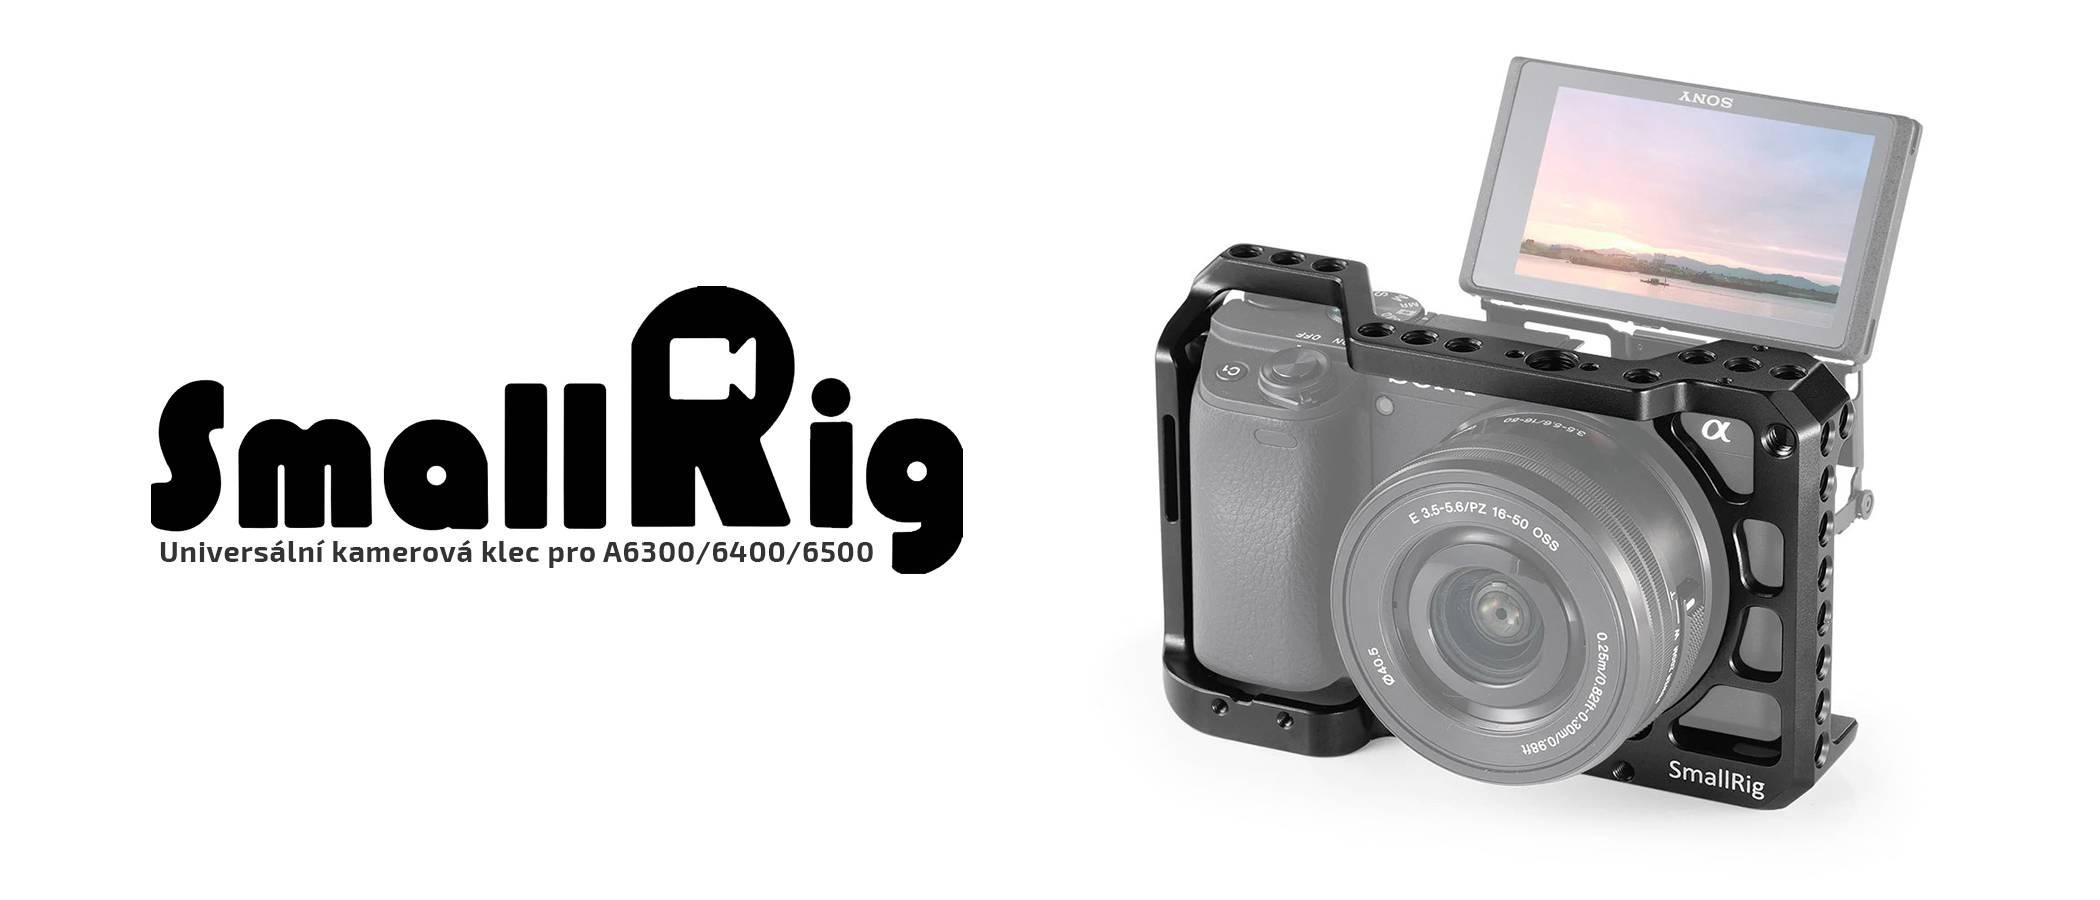 film-technika-smallrig-kamerová-klec-pro-sony-a6300-a6400-a6500